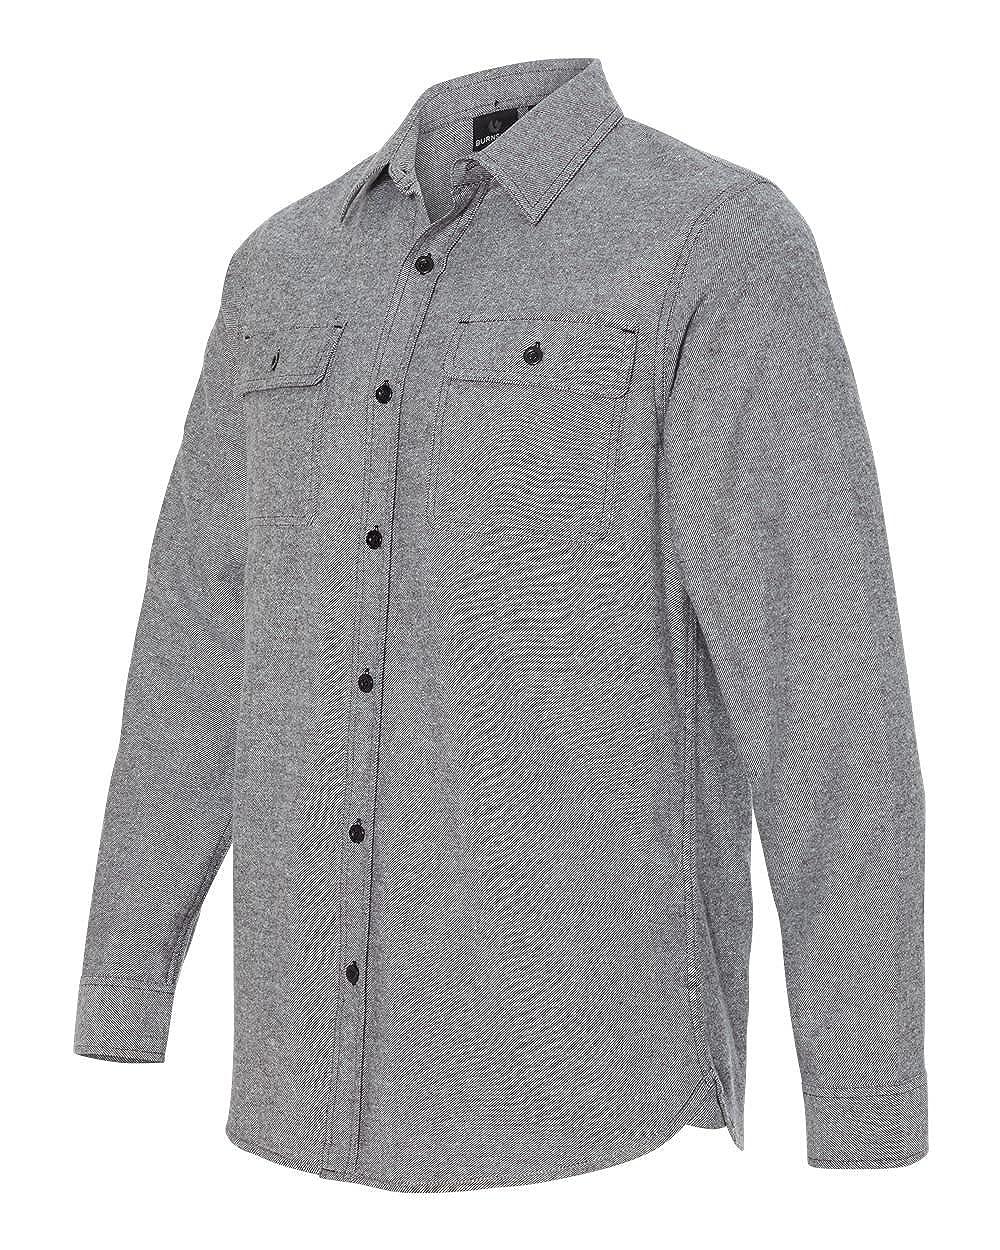 Burnside Mens Long Sleeve Solid Flannel Button Down Shirt B8200